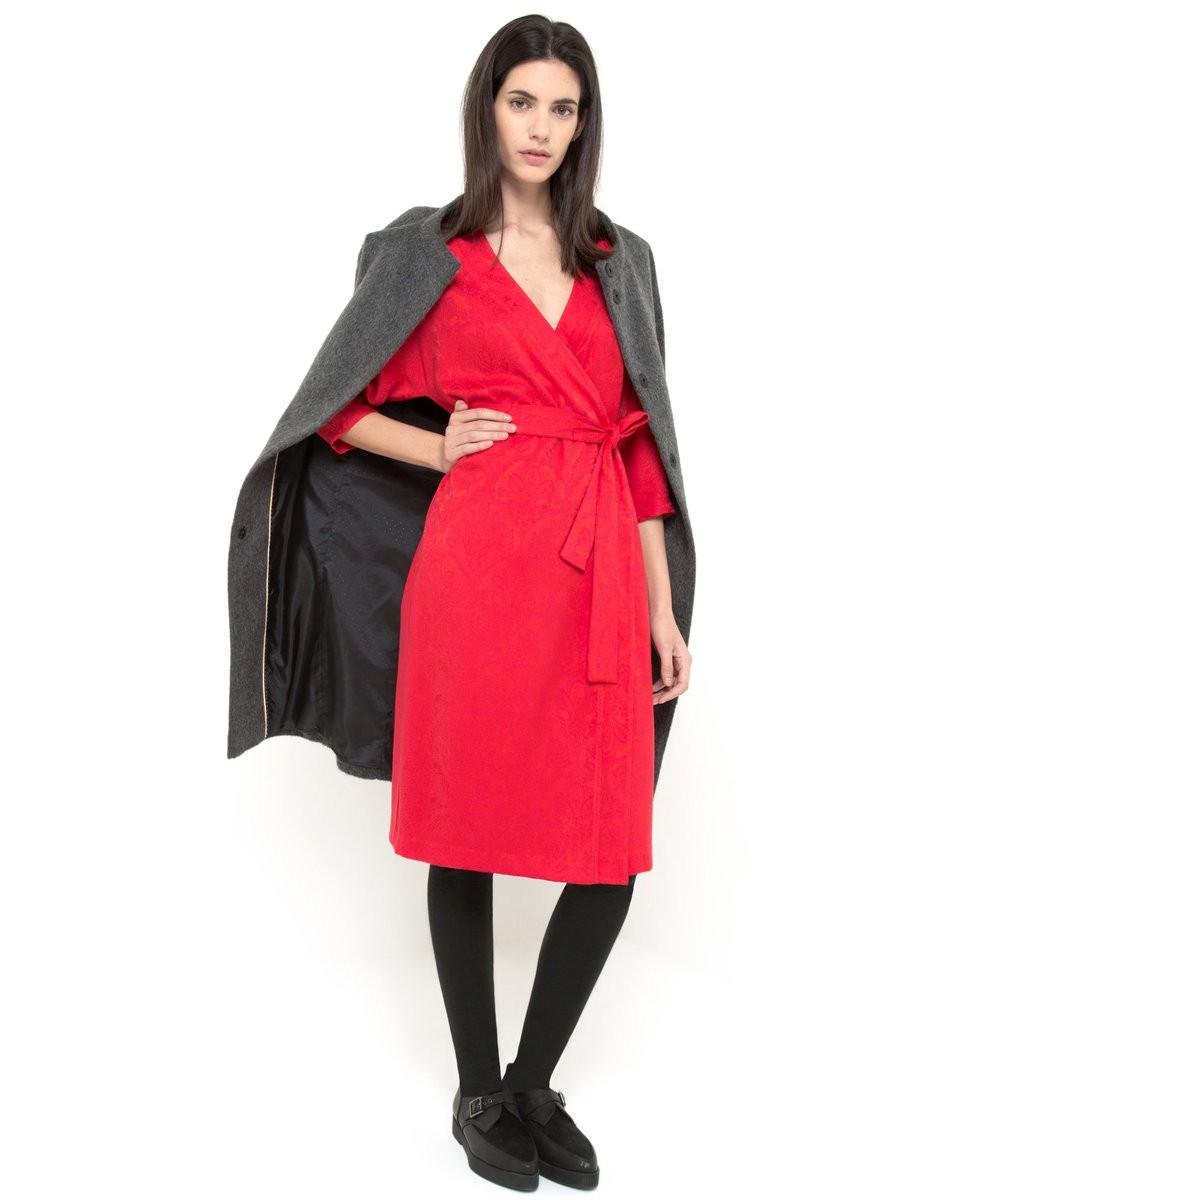 Robe rouge laura clement la redoute